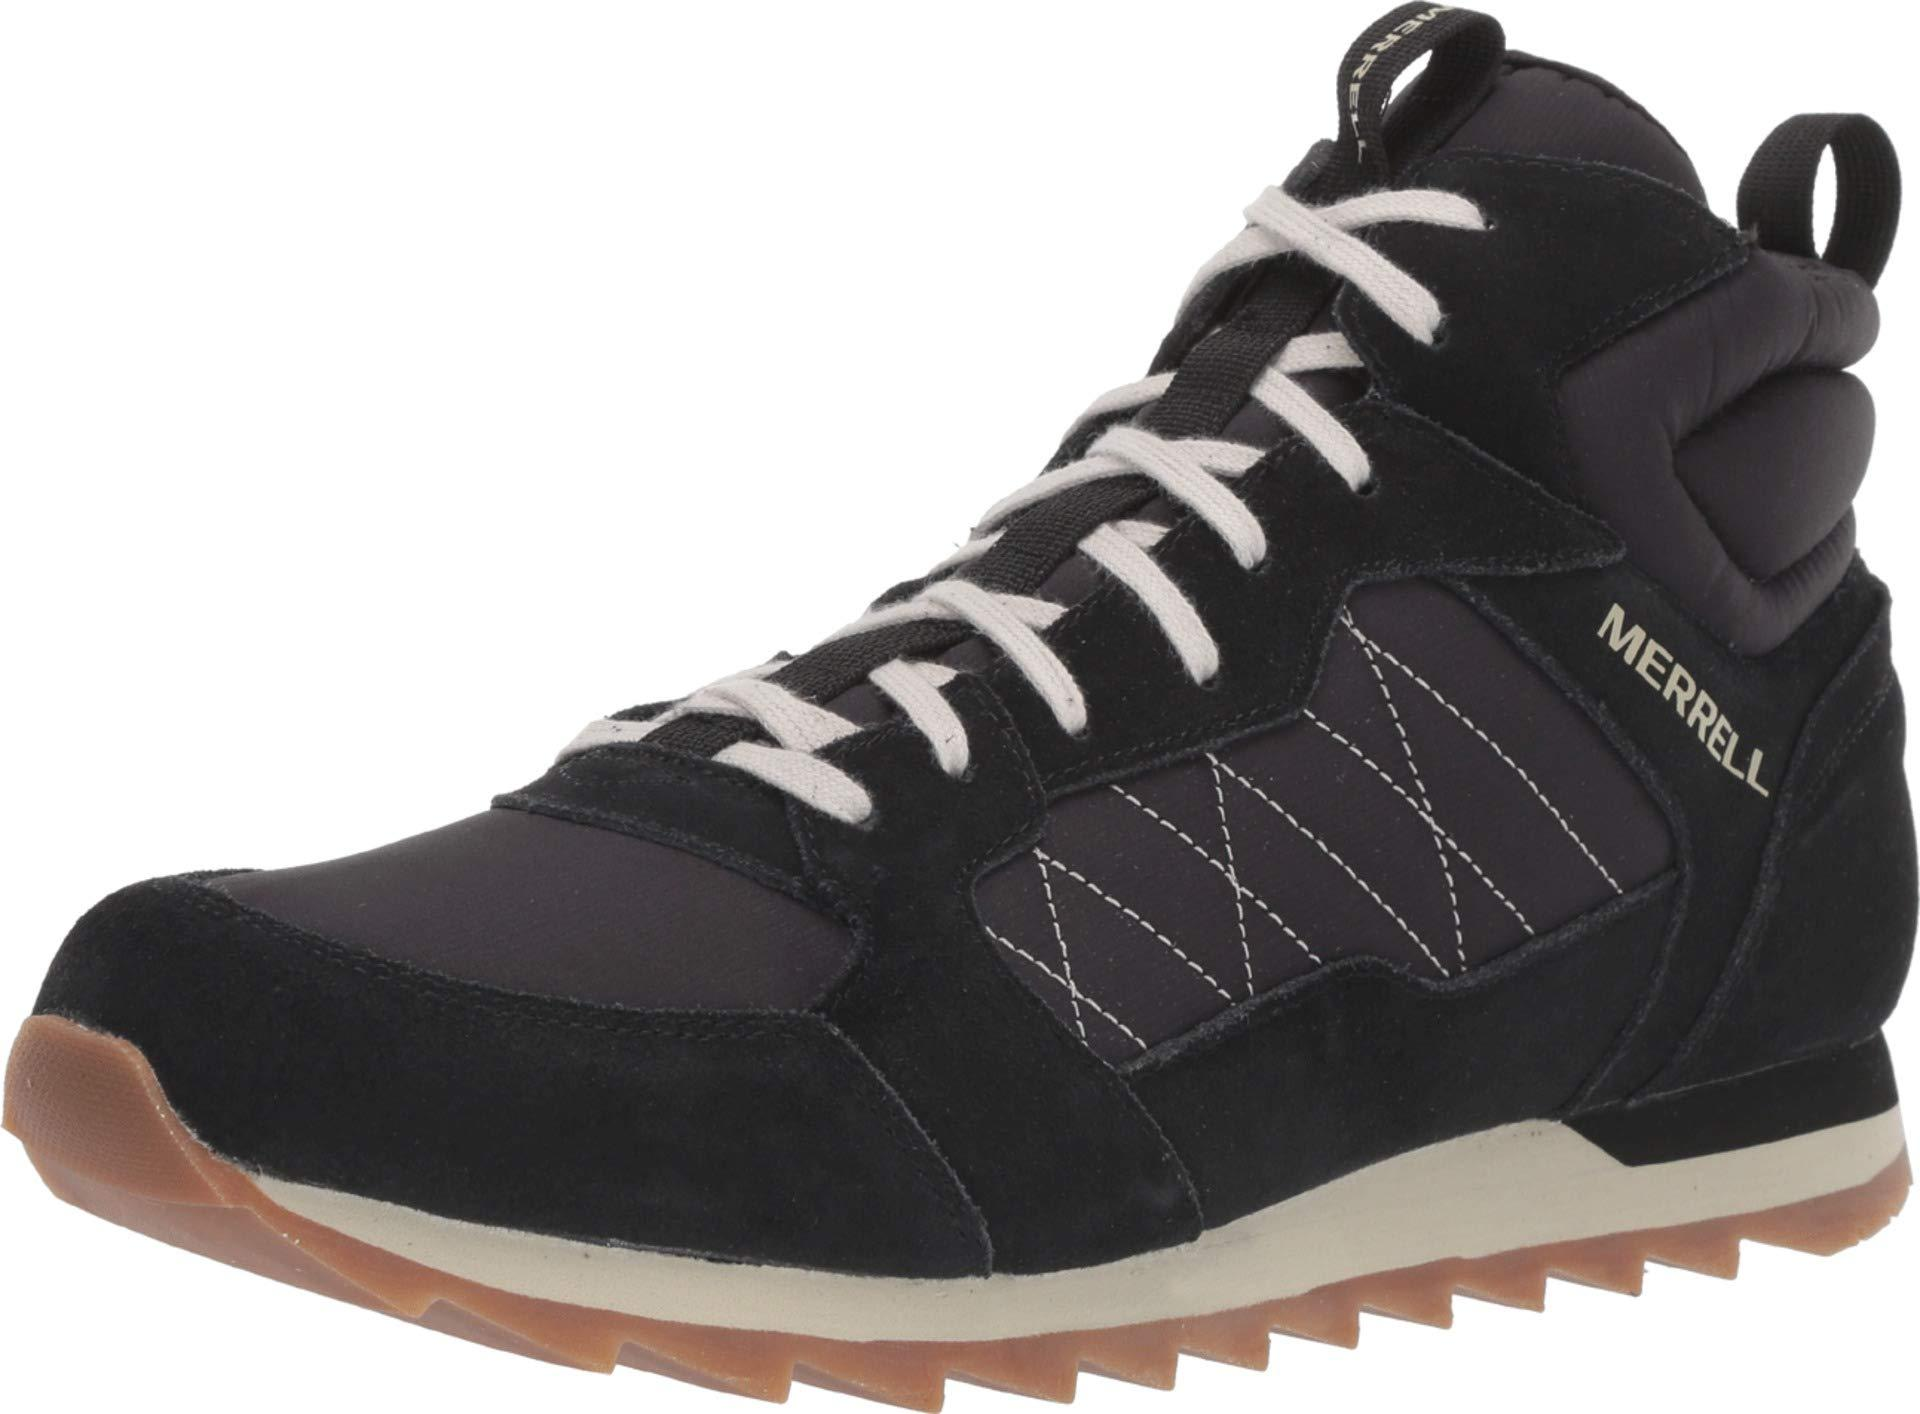 Merrell Leather Alpine Sneaker Mid